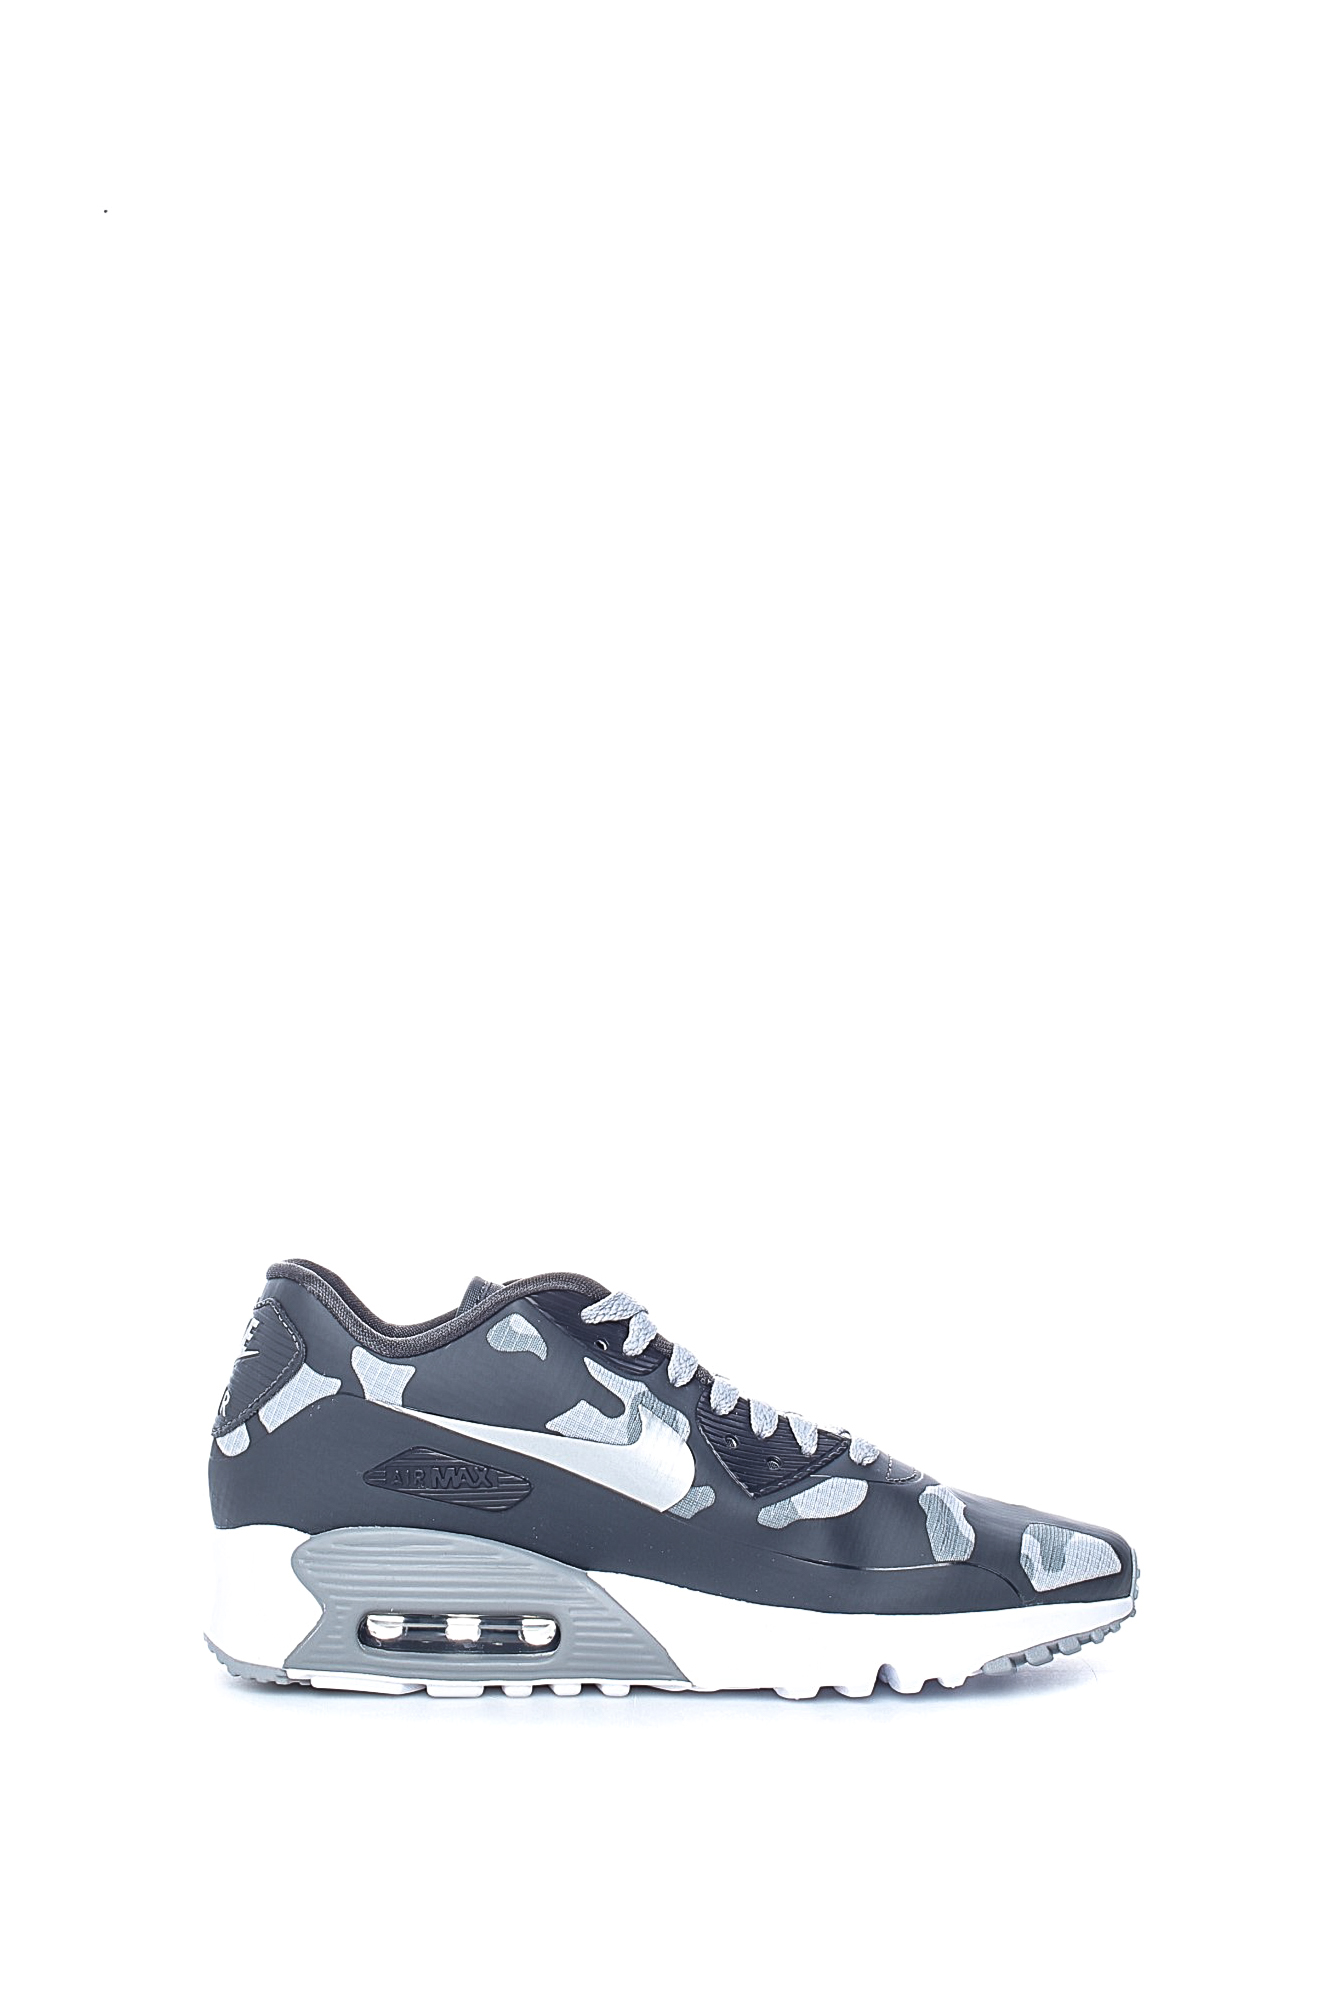 34444988b50 Παιδικά Παπούτσια για αγόρια και κορίτσια ⋆ EliteShoes.gr ⋆ Page ...